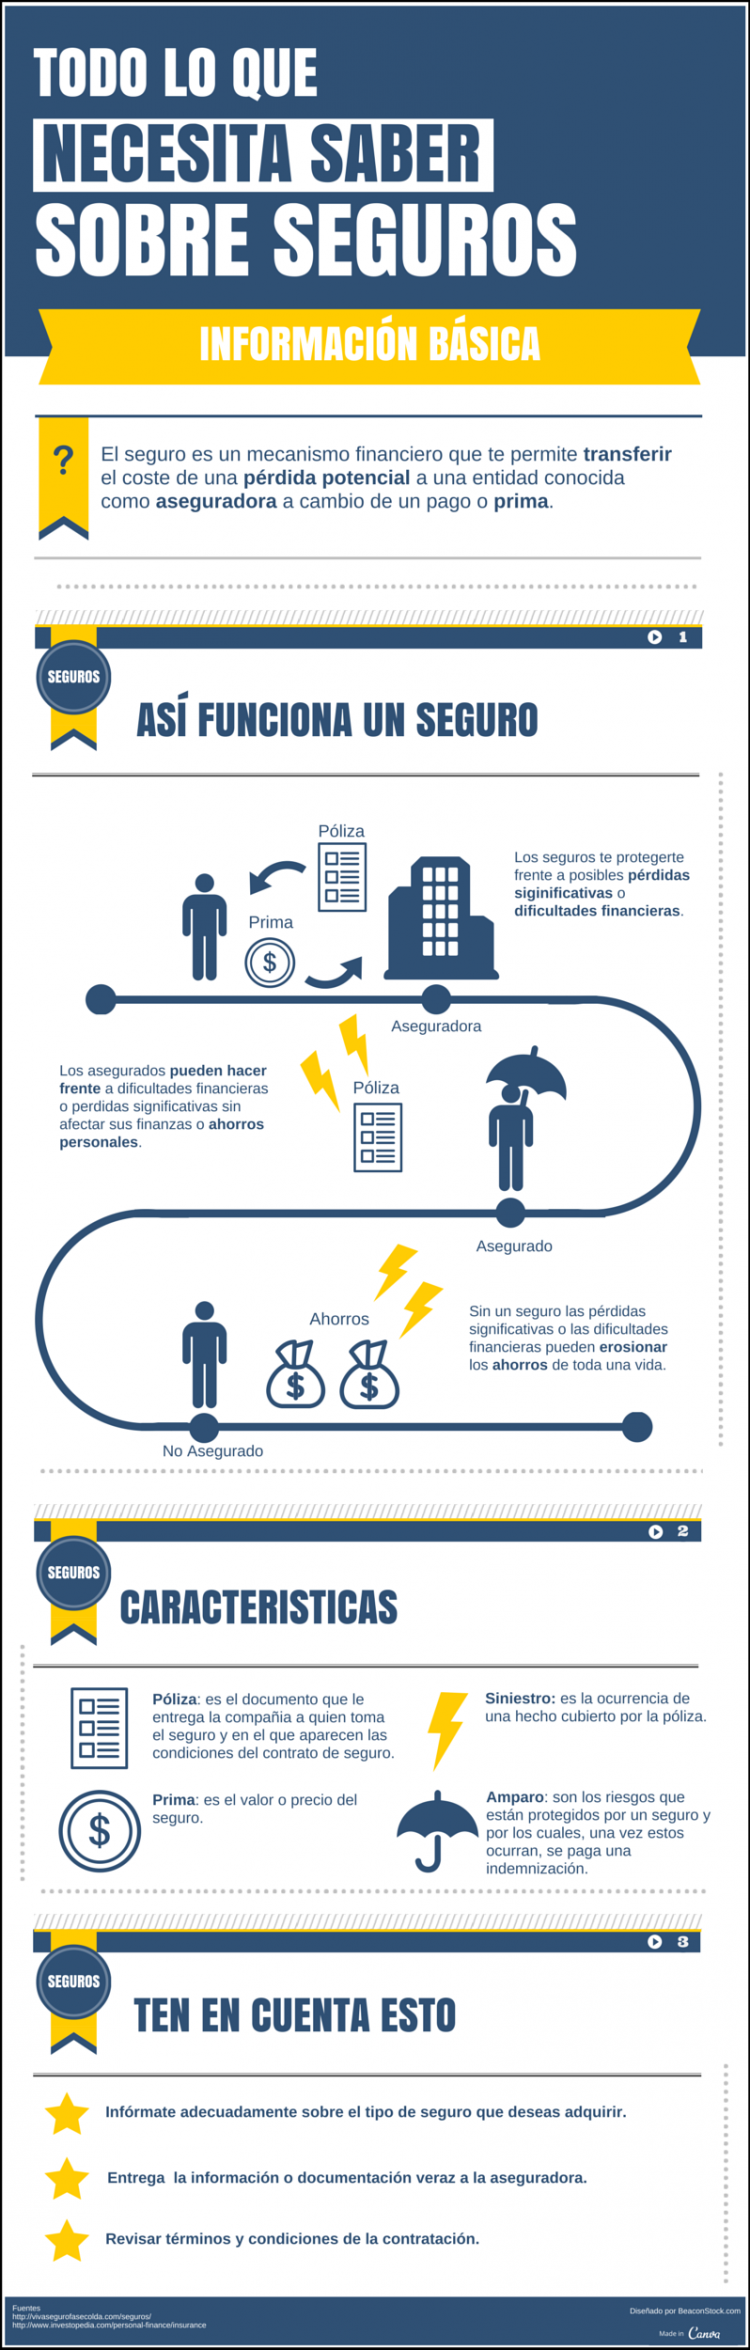 Seguro de Vida: qué necesitas saber #infografia #infographic